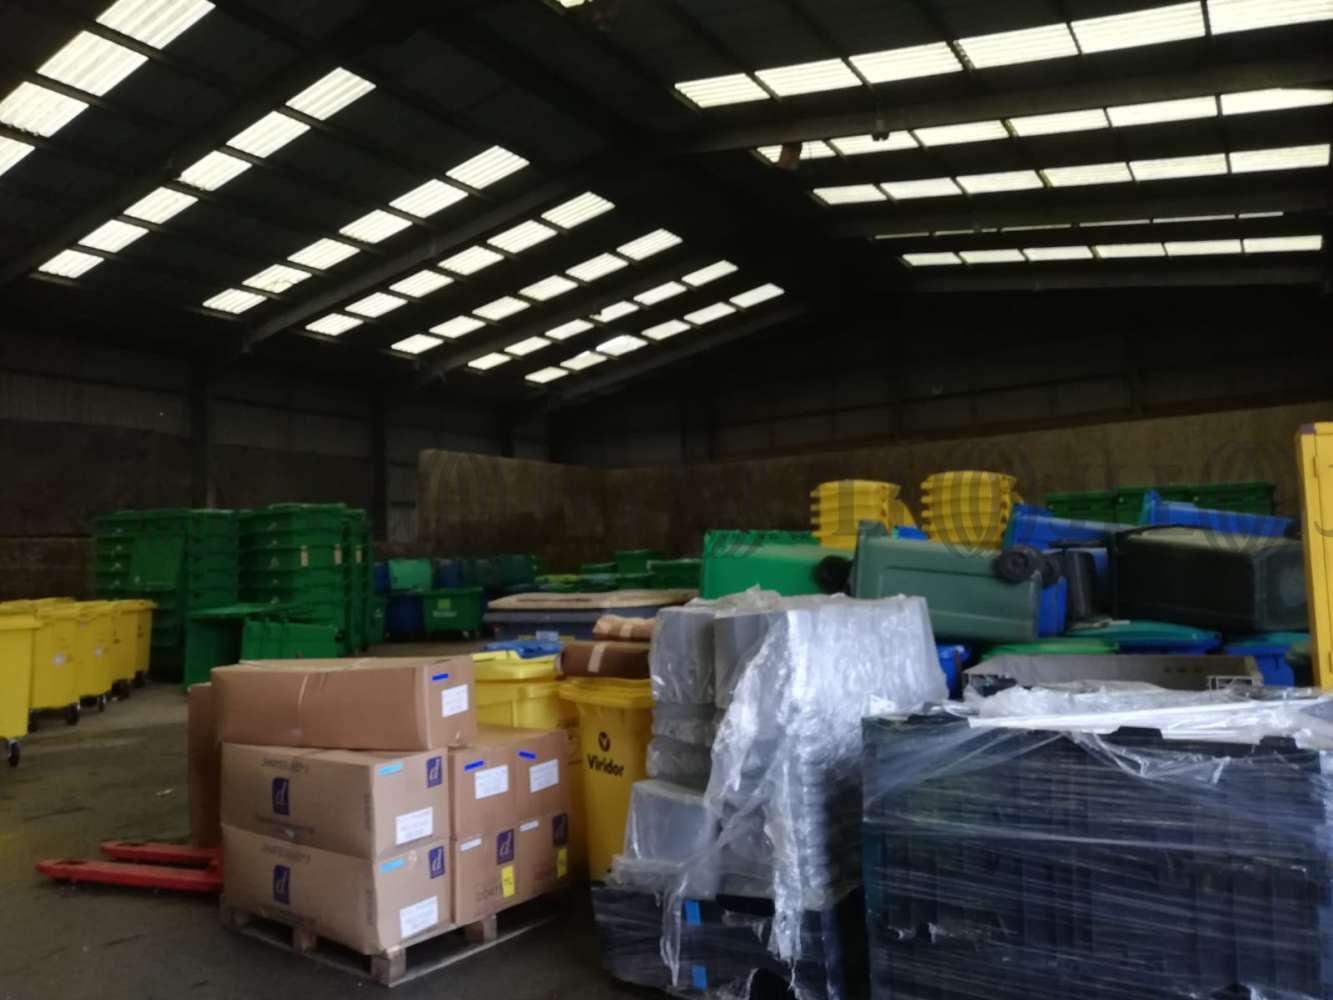 Industrial Plymouth, plympton, newnham industrial estate, PL7 4JW - Viridor